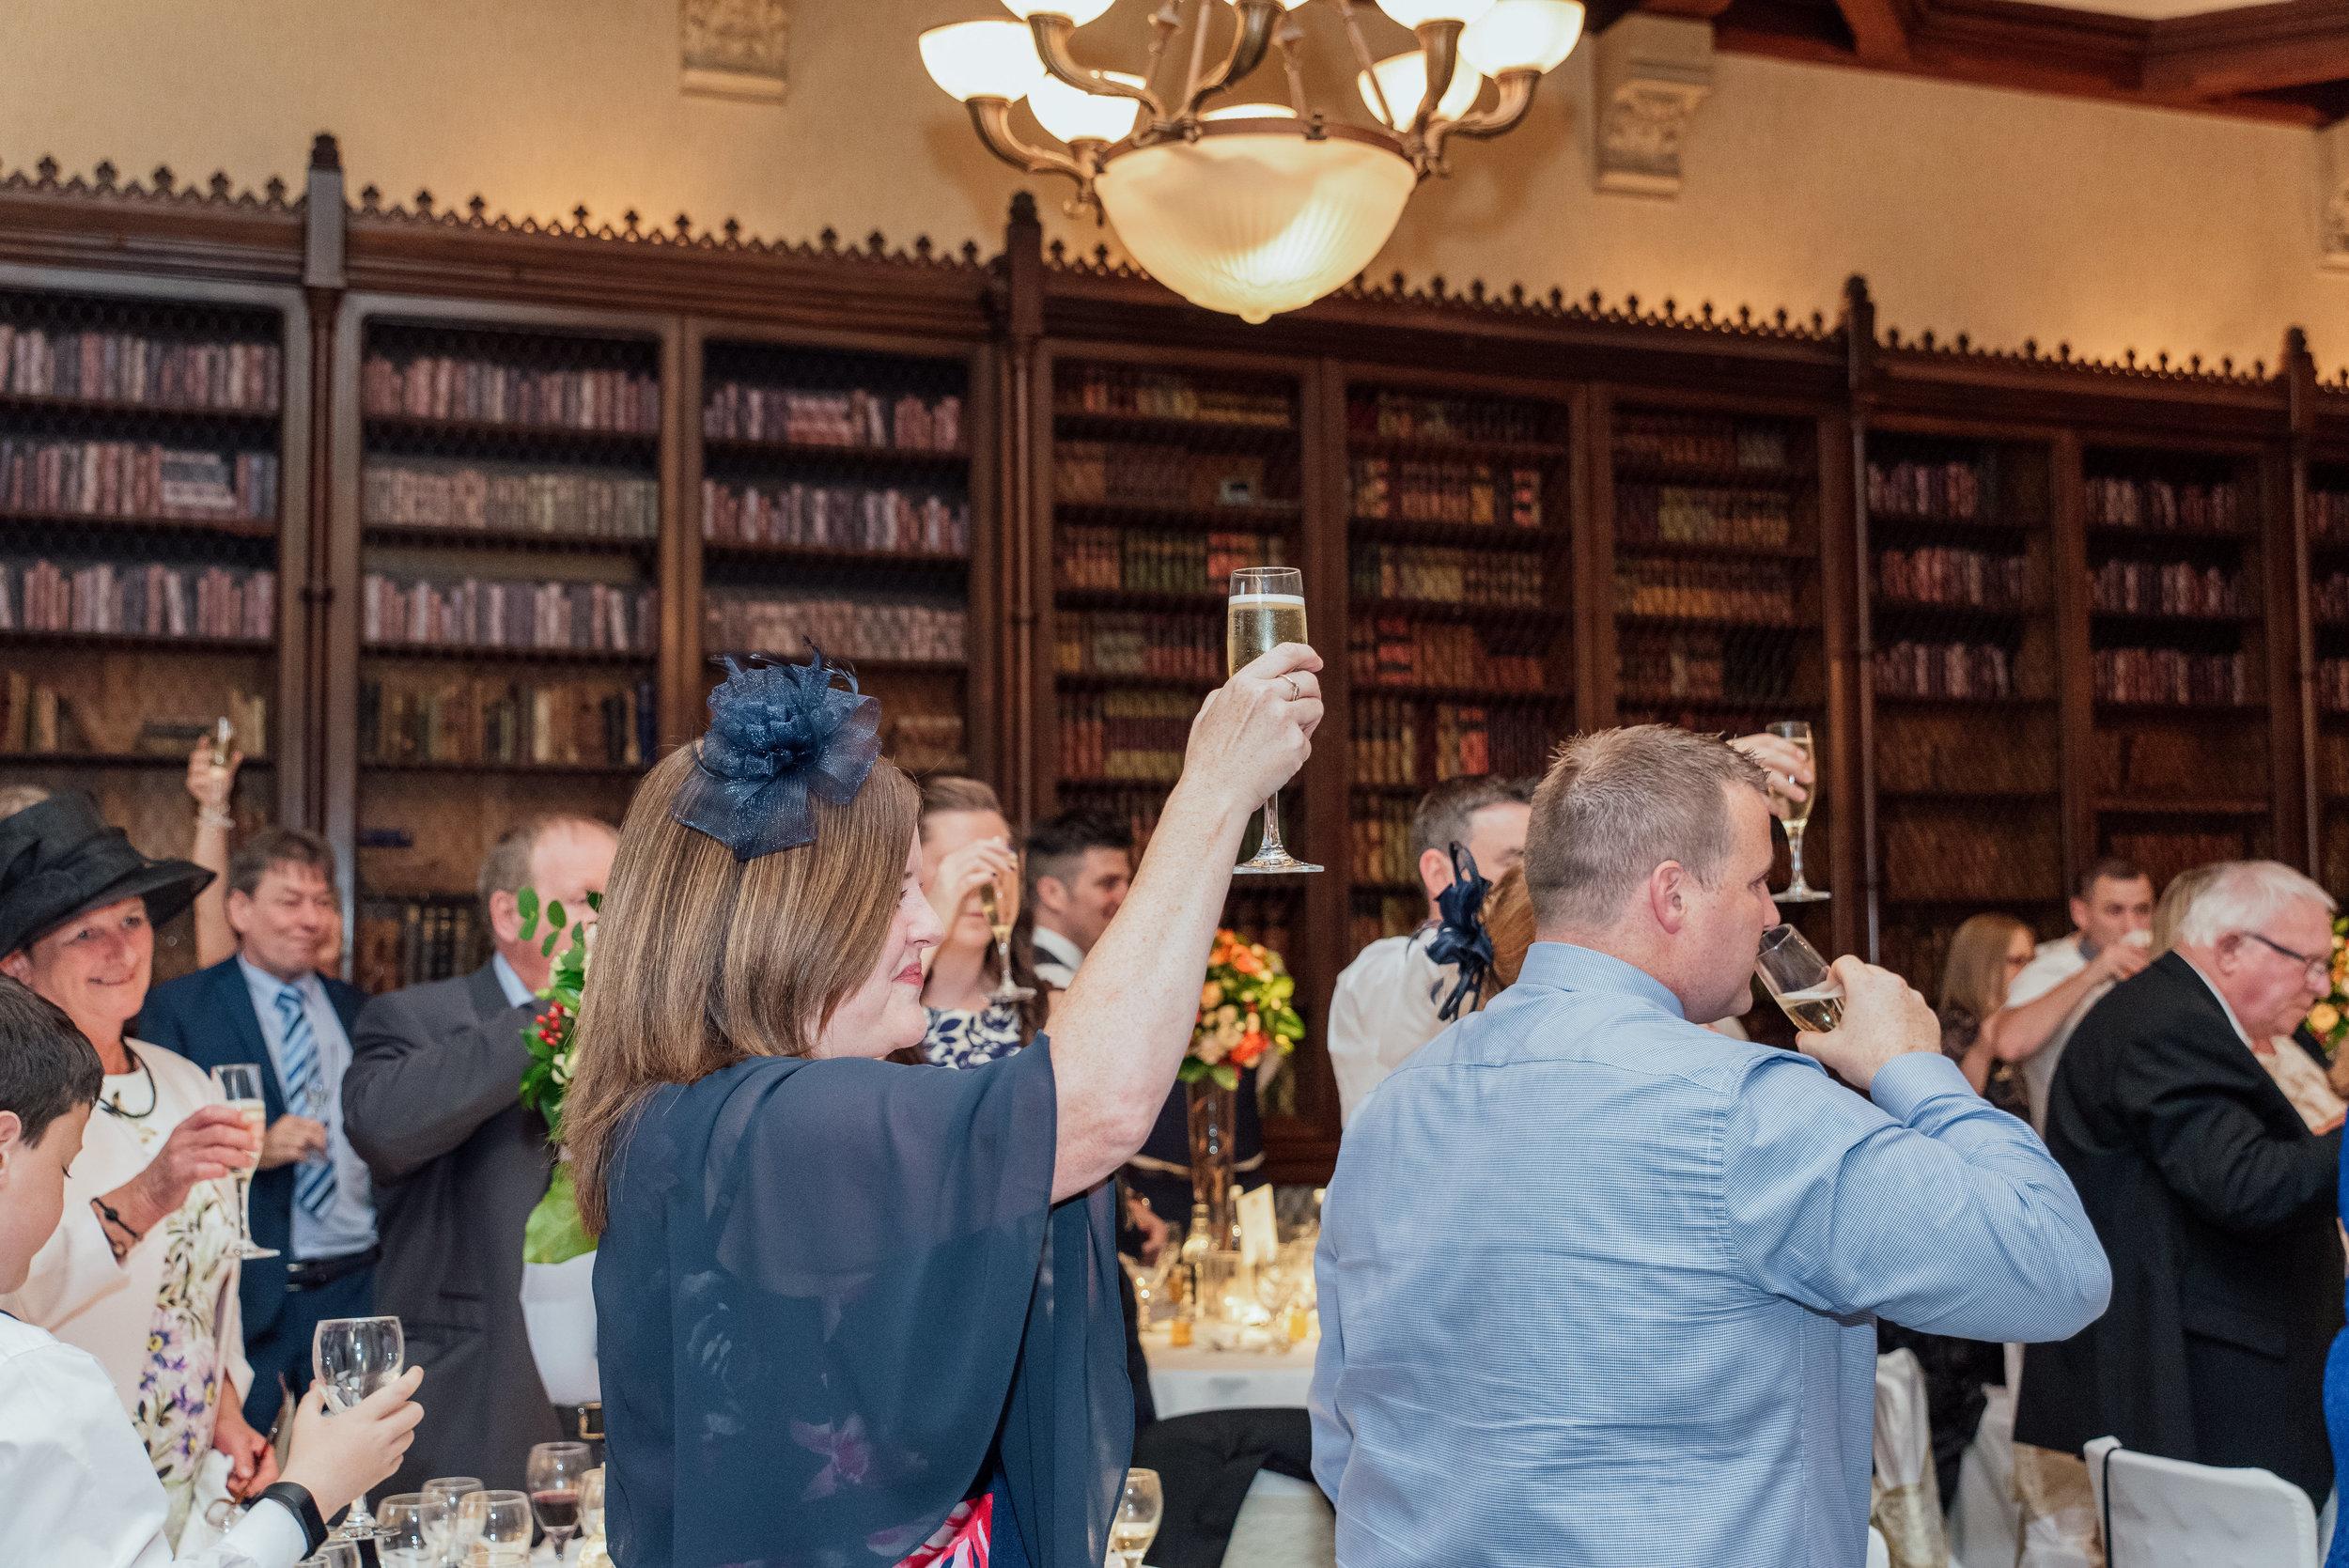 Wedding Speeches The Elvetham Fleet Hampshire Wedding Venue - Amy James Photography - Documentary wedding photographer Hampshire